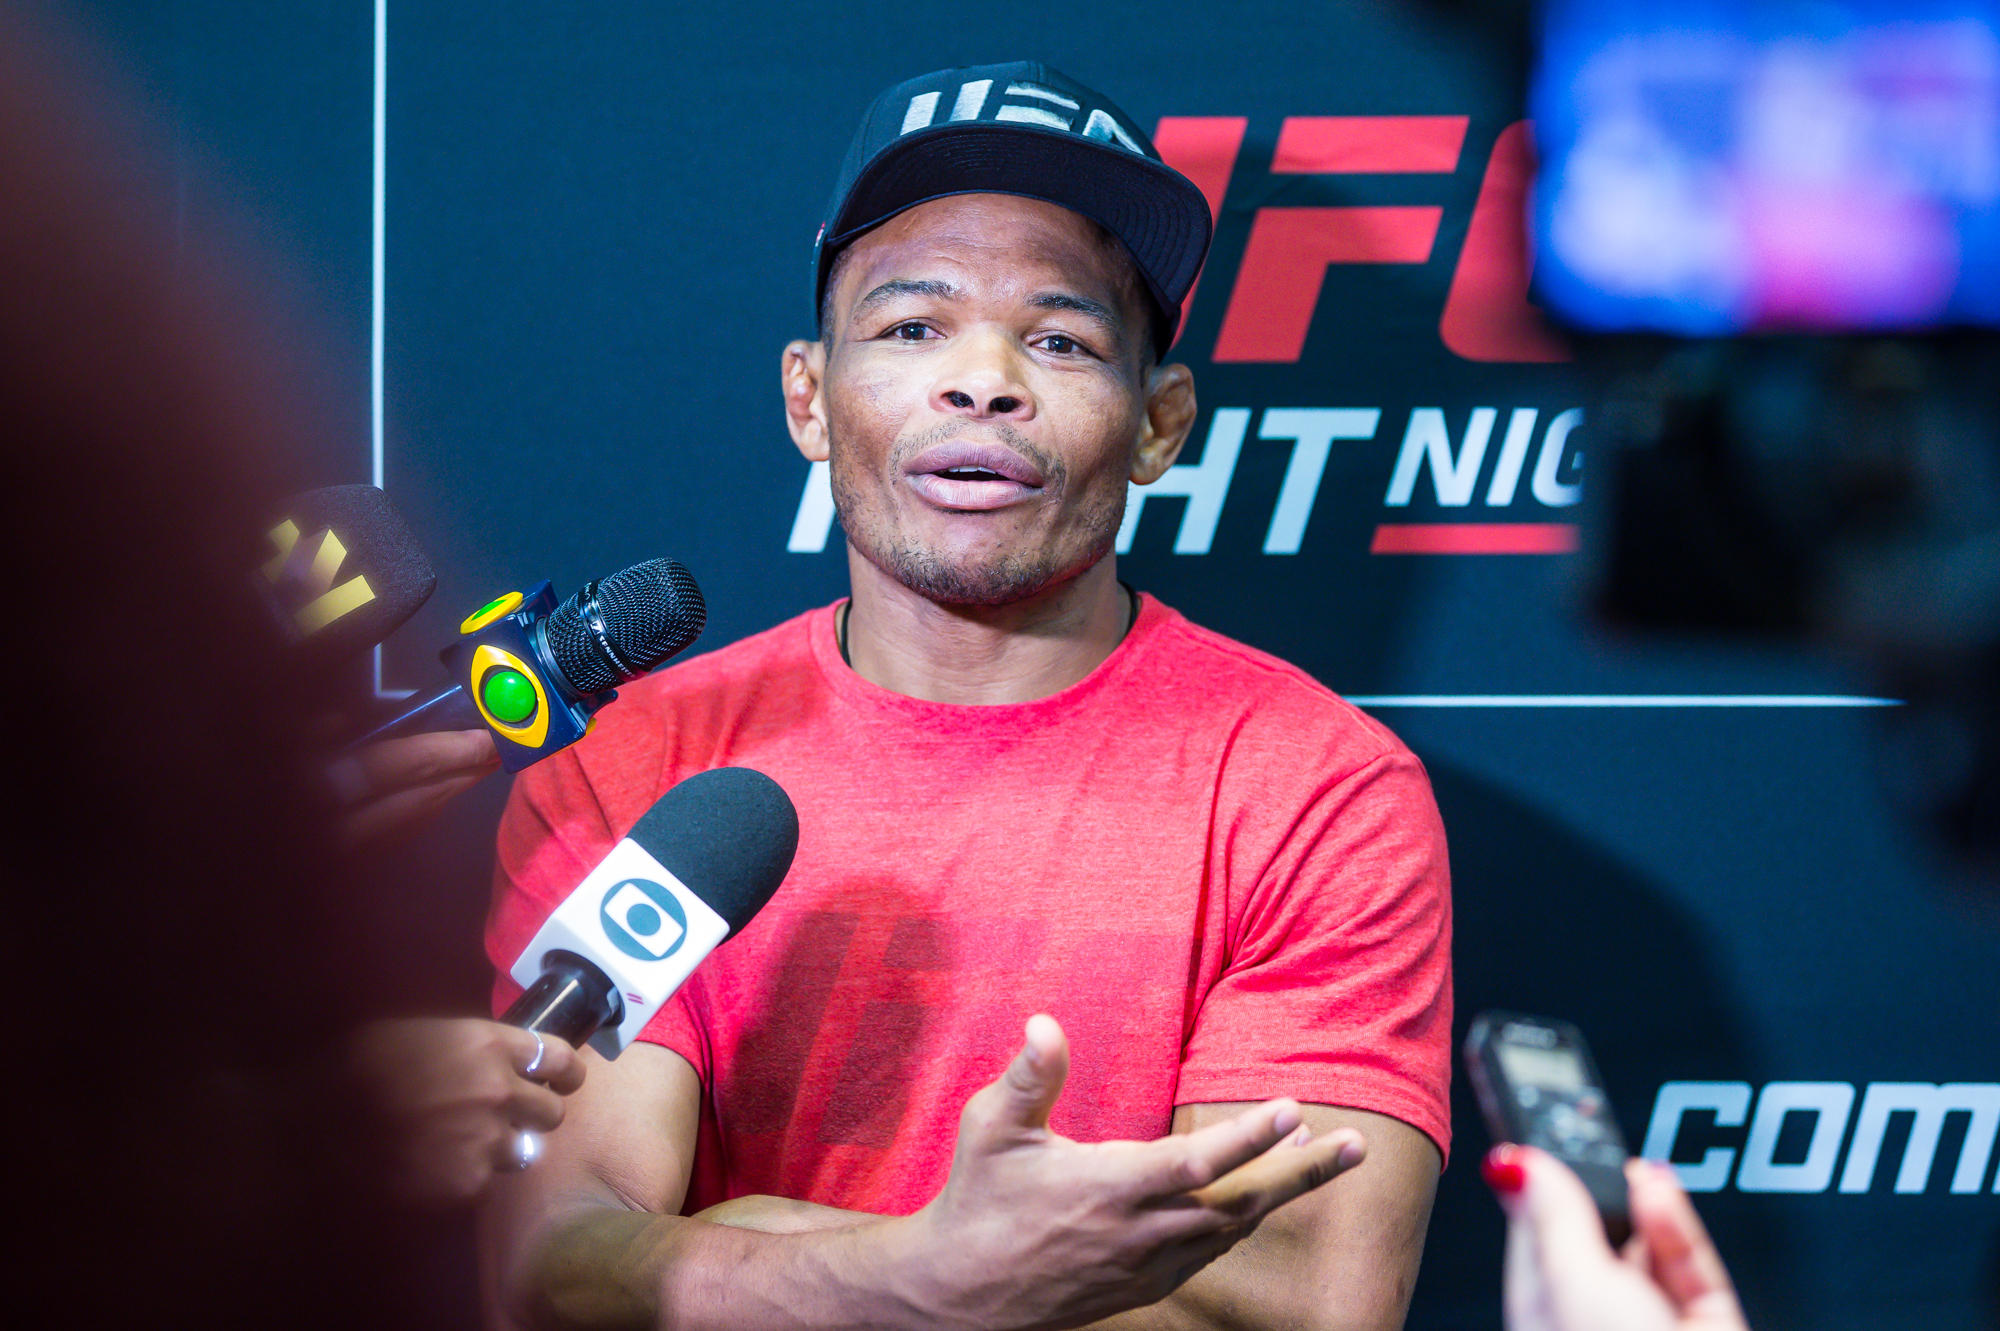 Francisco Trinaldo is set to face Dwight Grant at UFC Vegas 41.